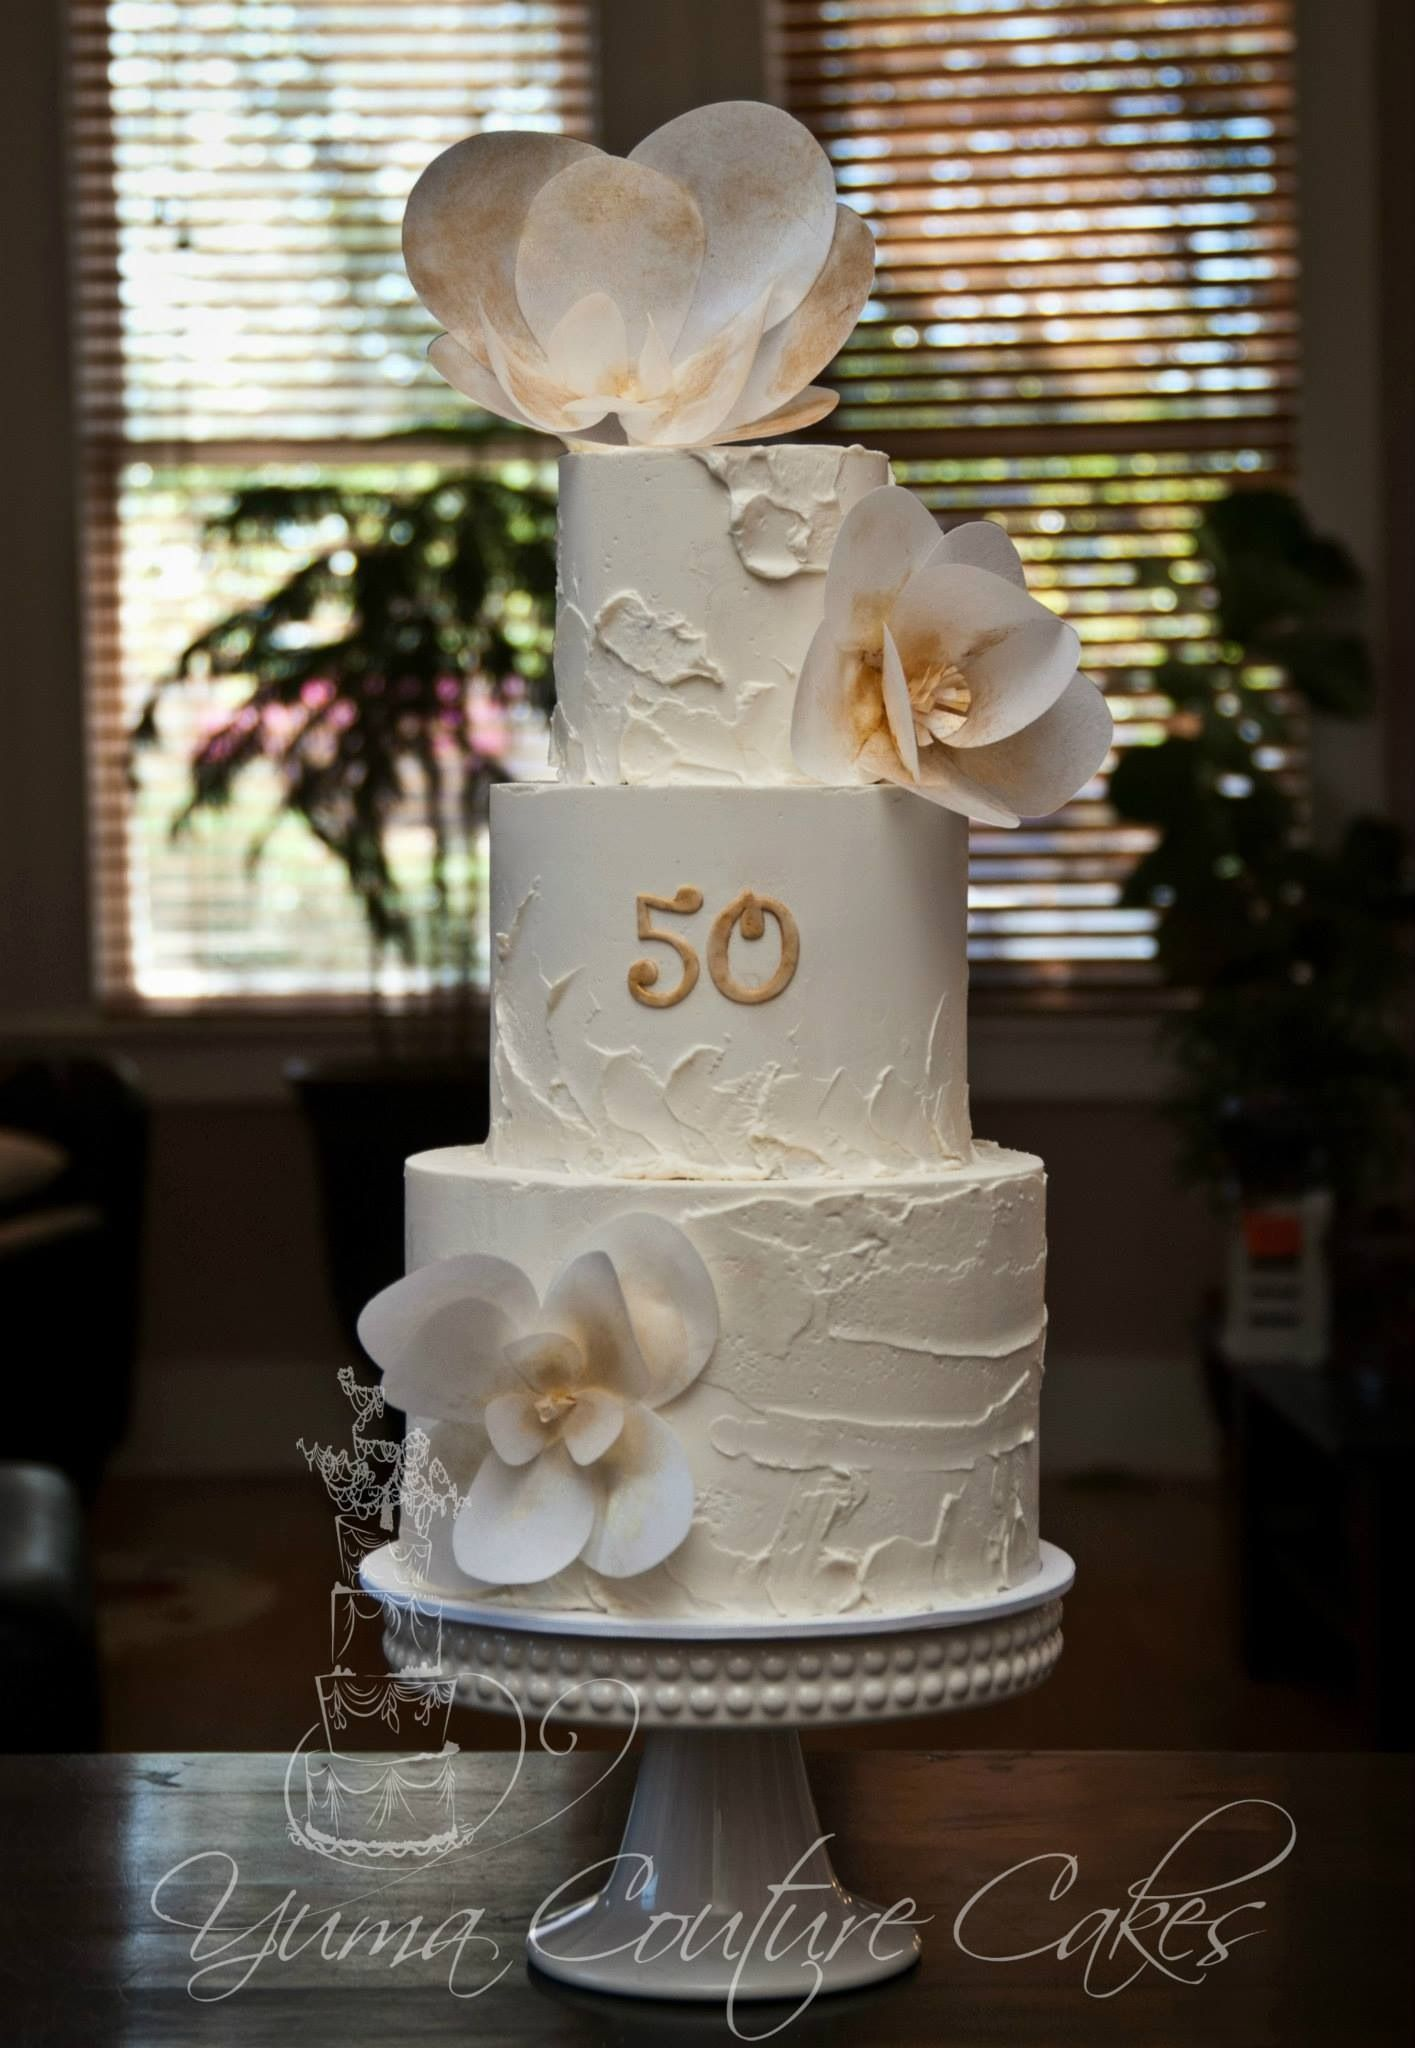 Yuma Couture Cakes > Yuma Arizona USA